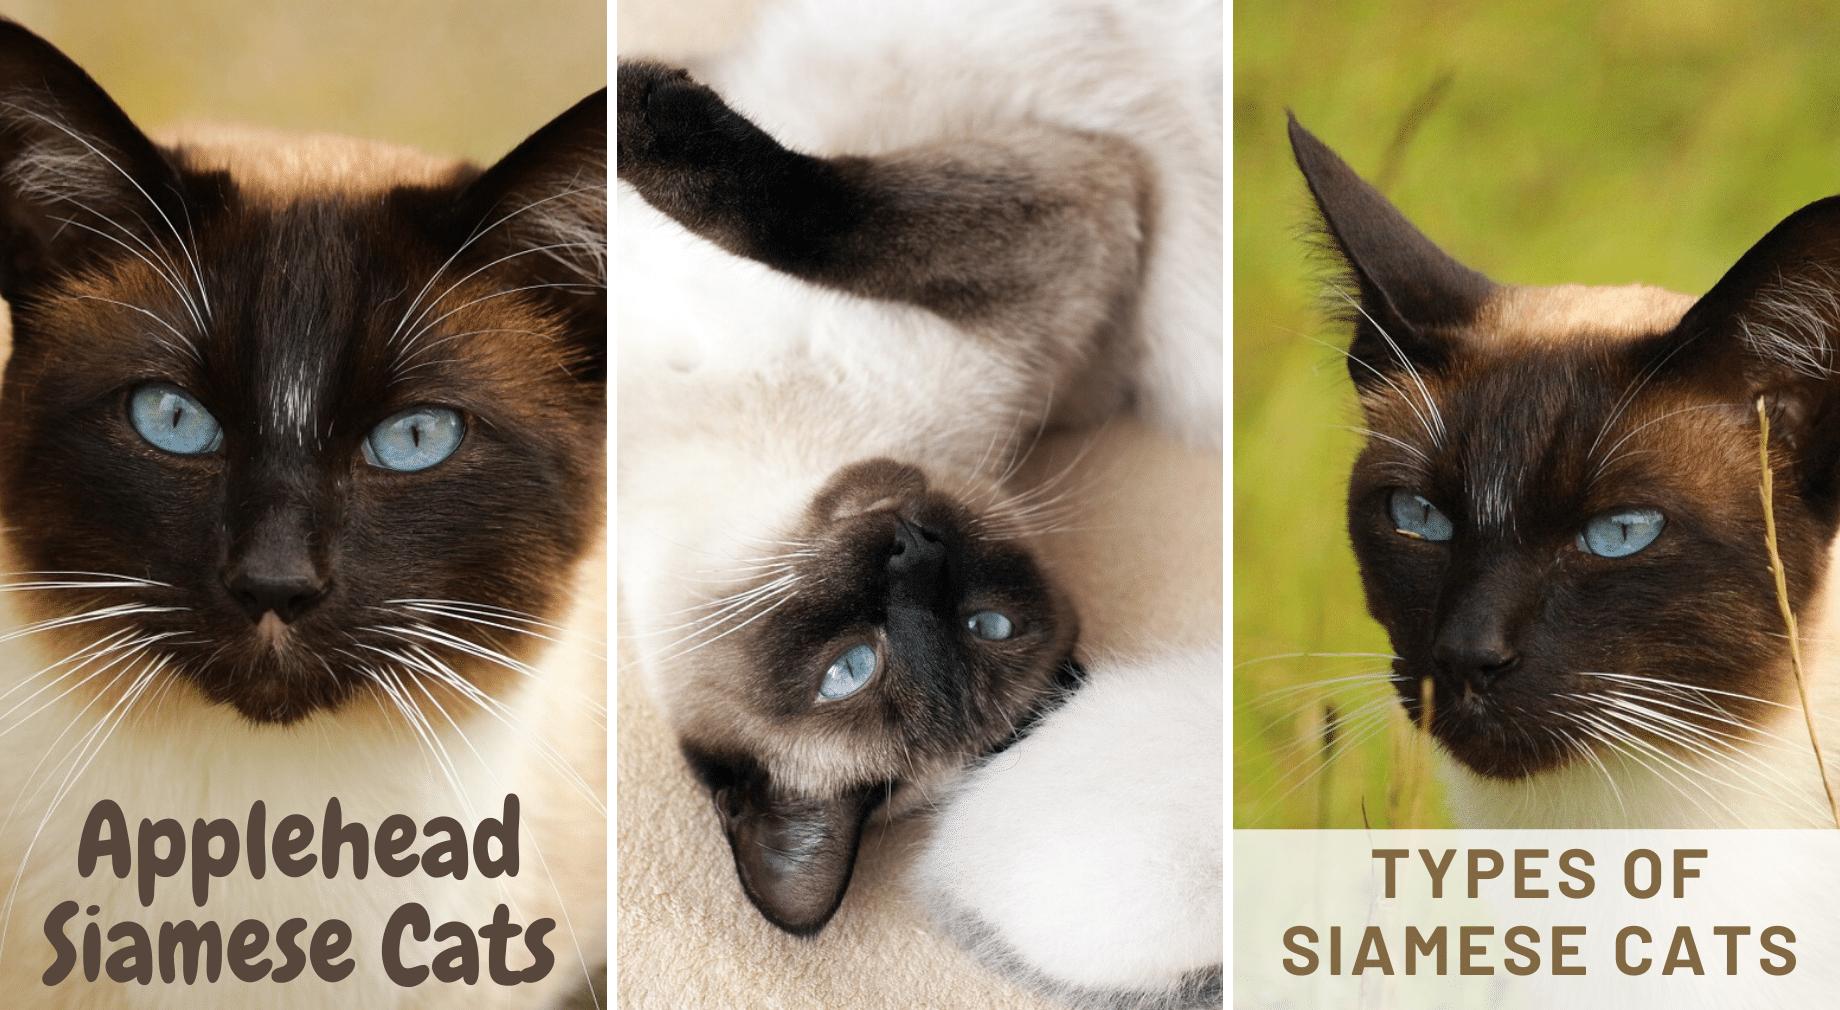 Applehead Siamese Cats